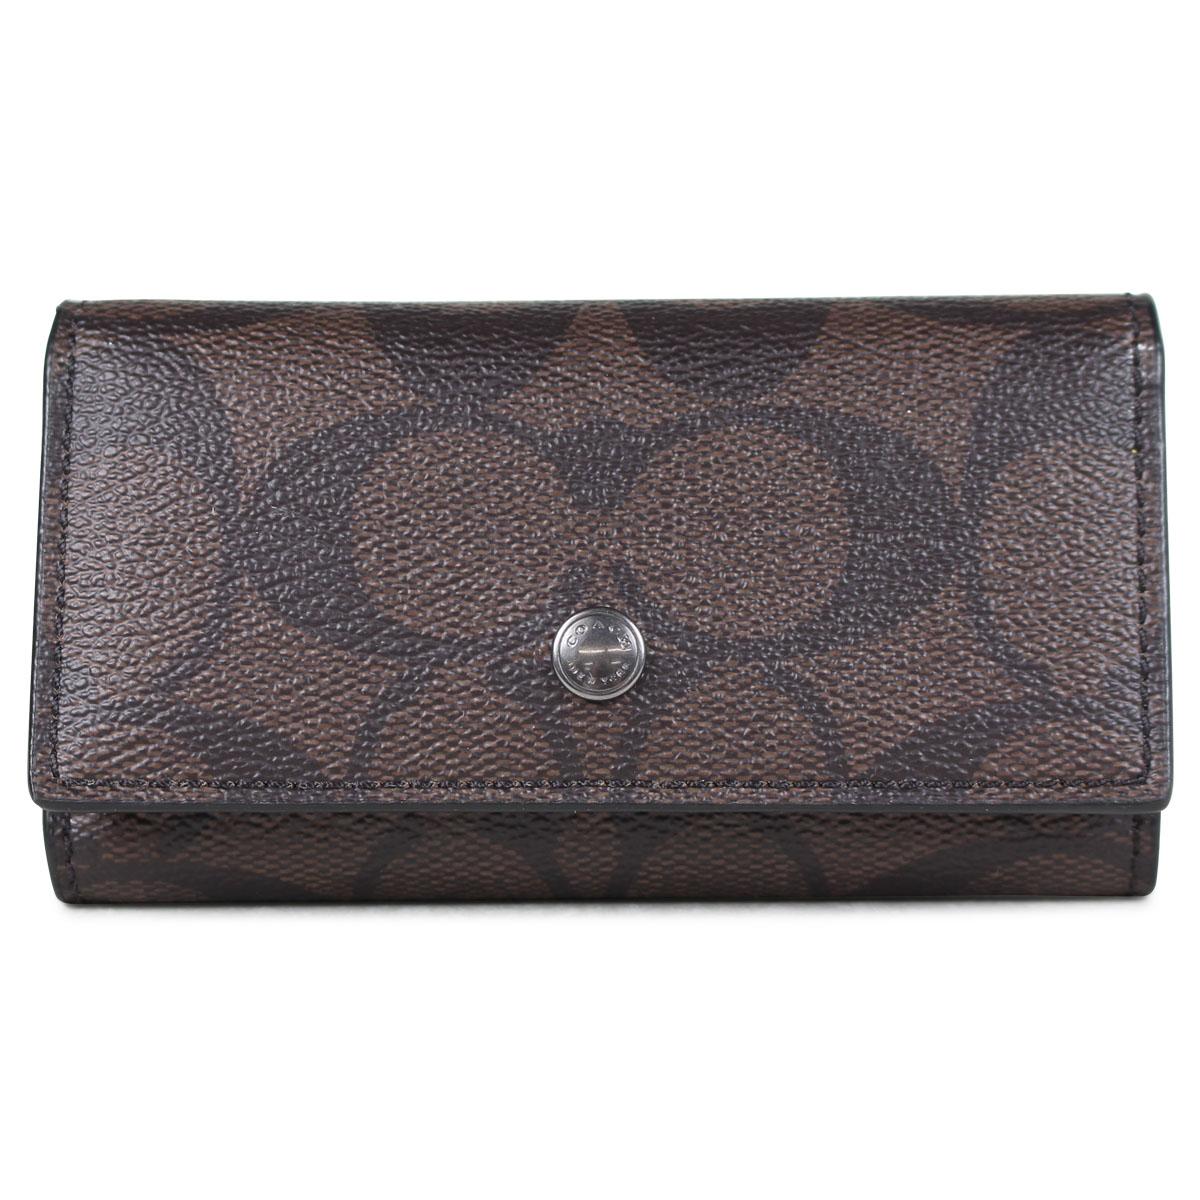 51908dc2 COACH F26104 coach key case men gap Dis leather brown [7/10 Shinnyu load]  [187]